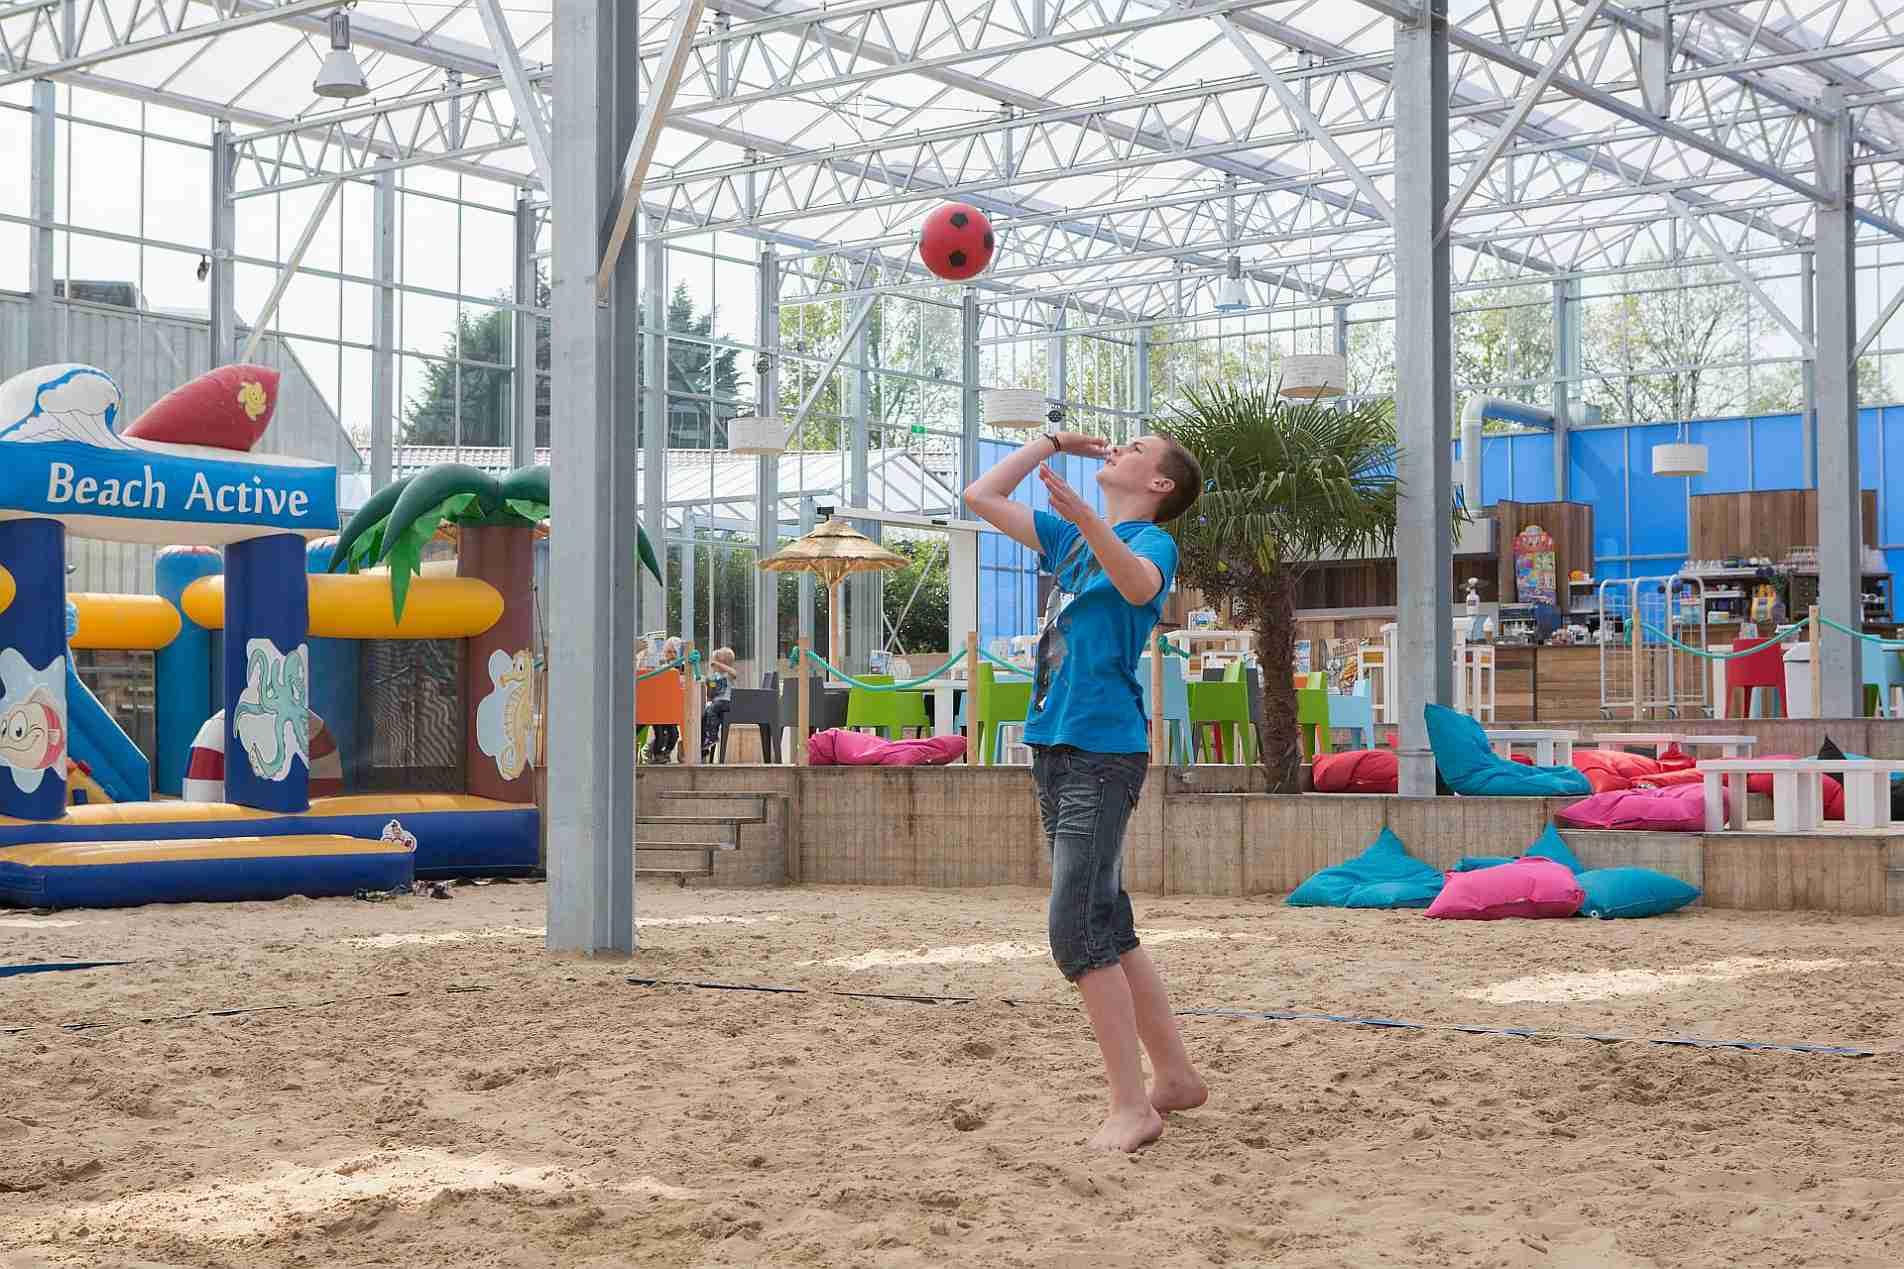 Gezellig, actief en gaaf kinderfeestje in Hardenberg - Kinderfeestje in Dedemsvaart